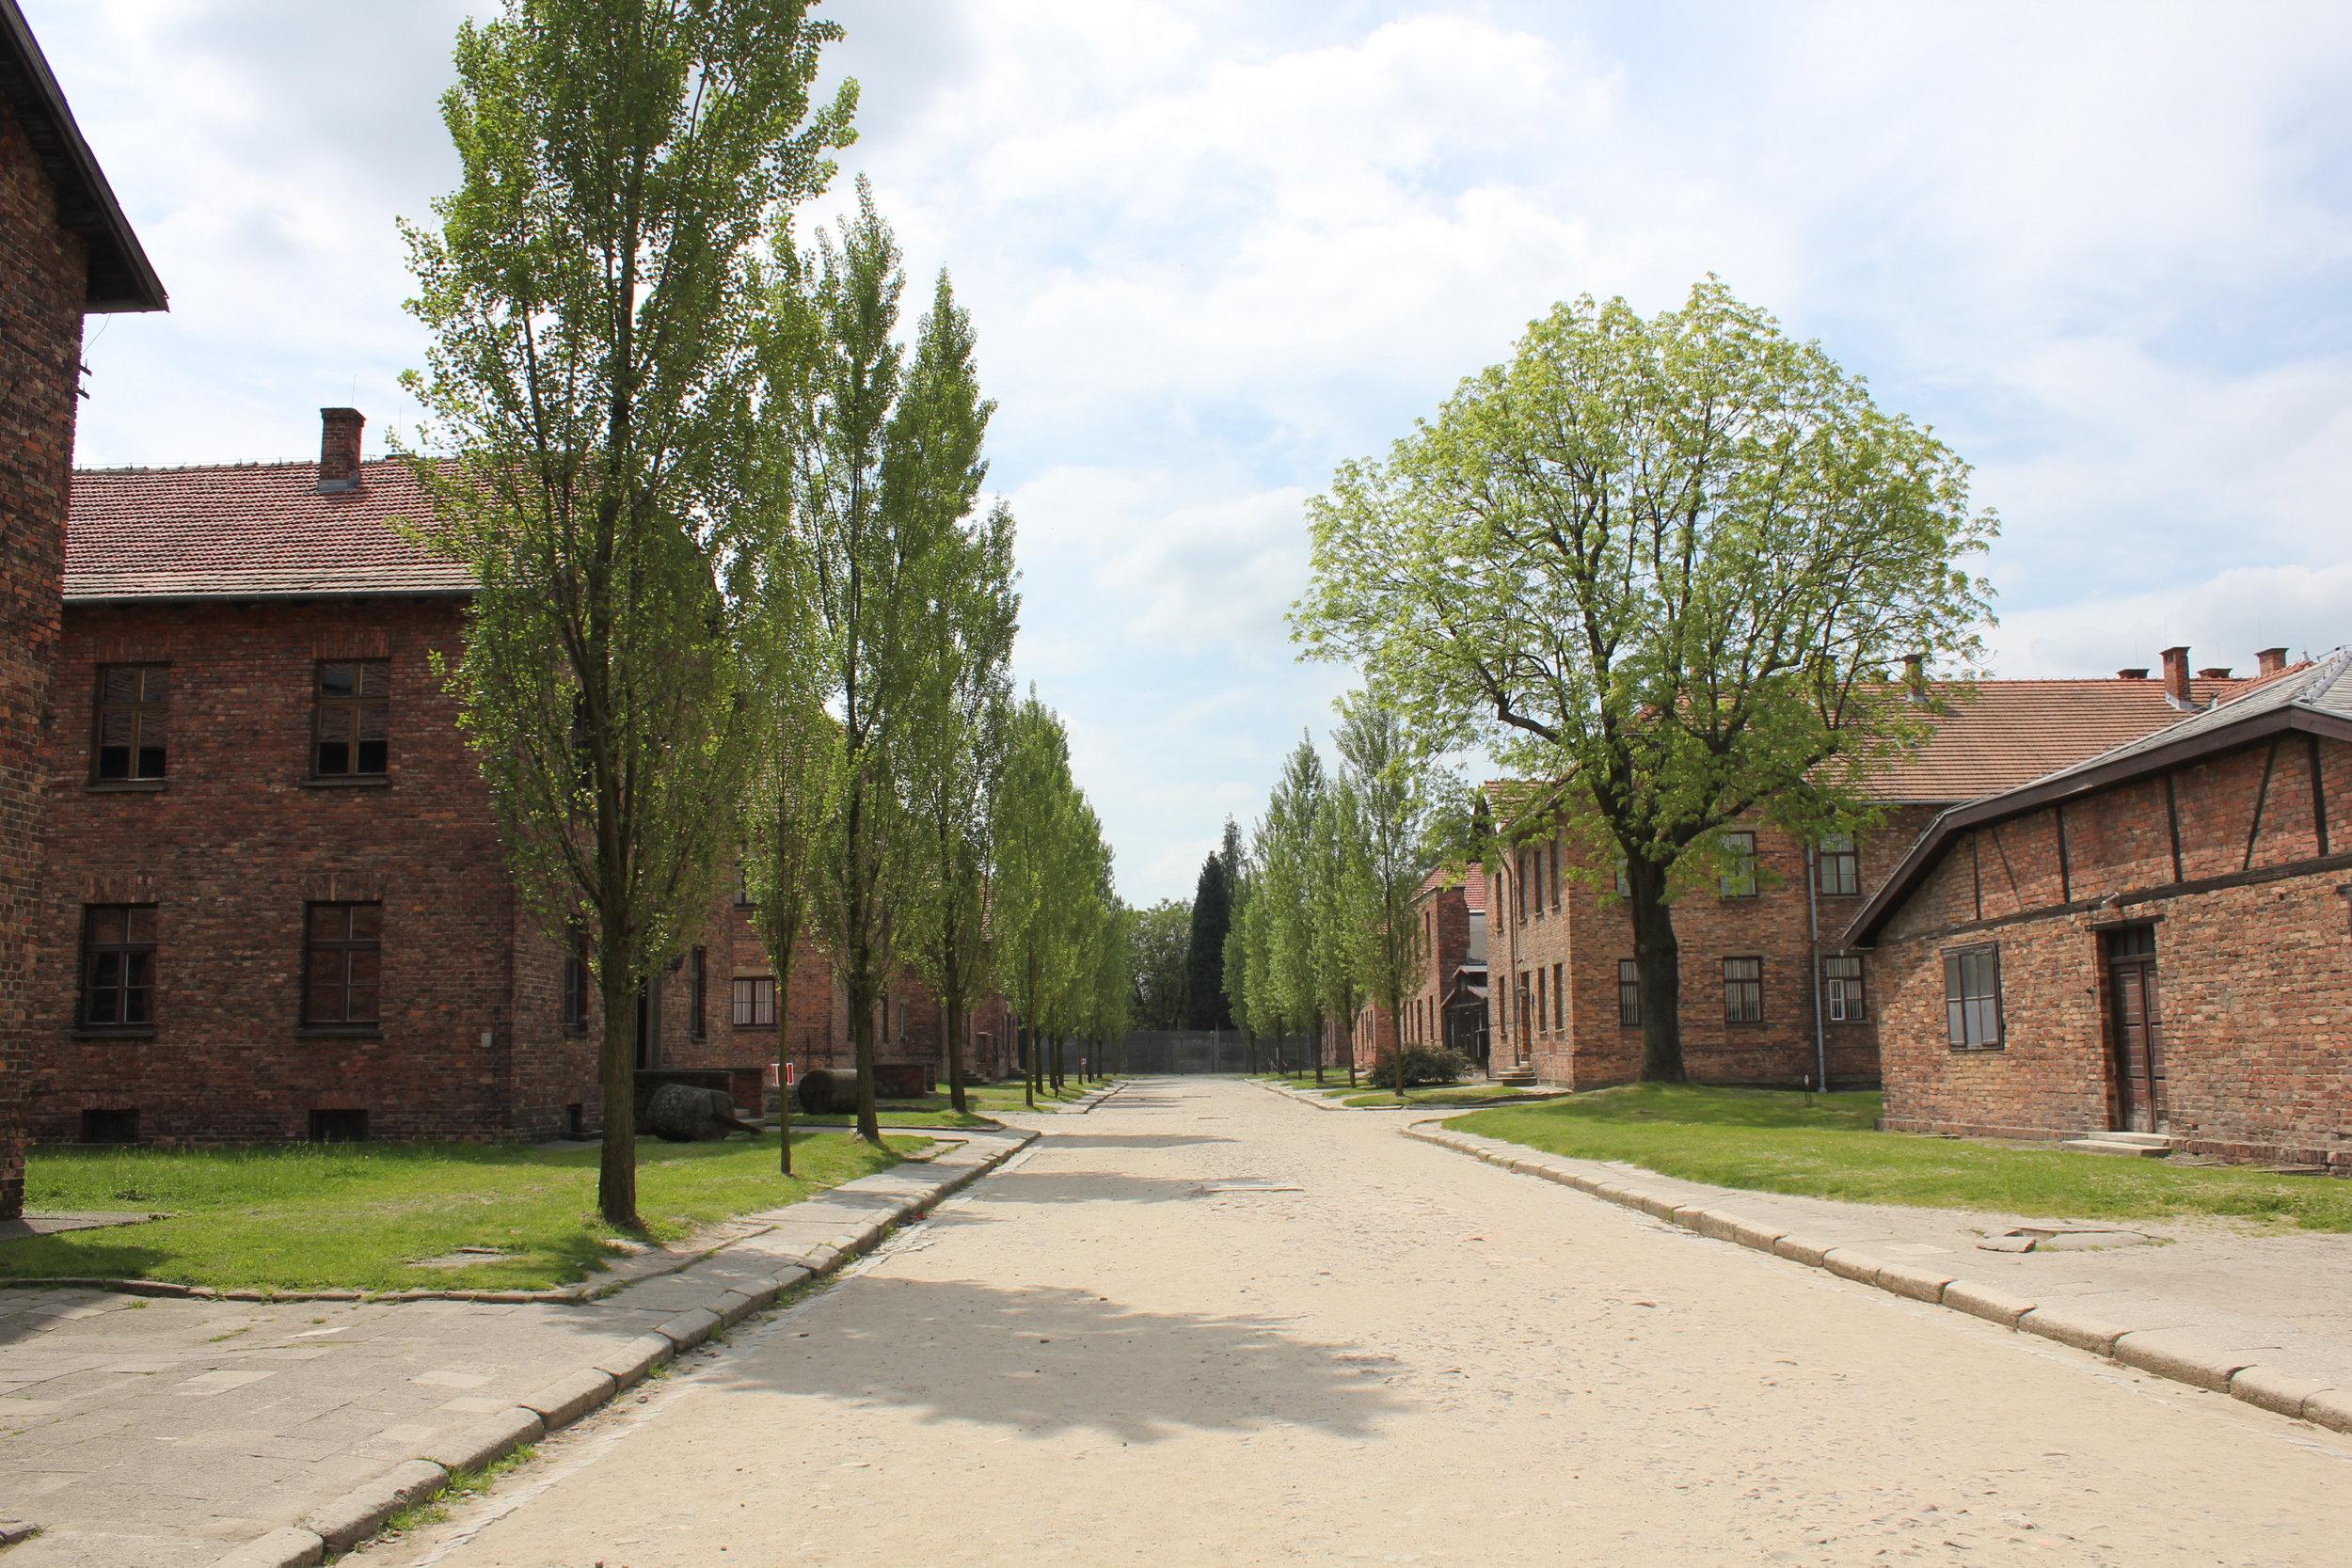 The barracks at Auschwitz I